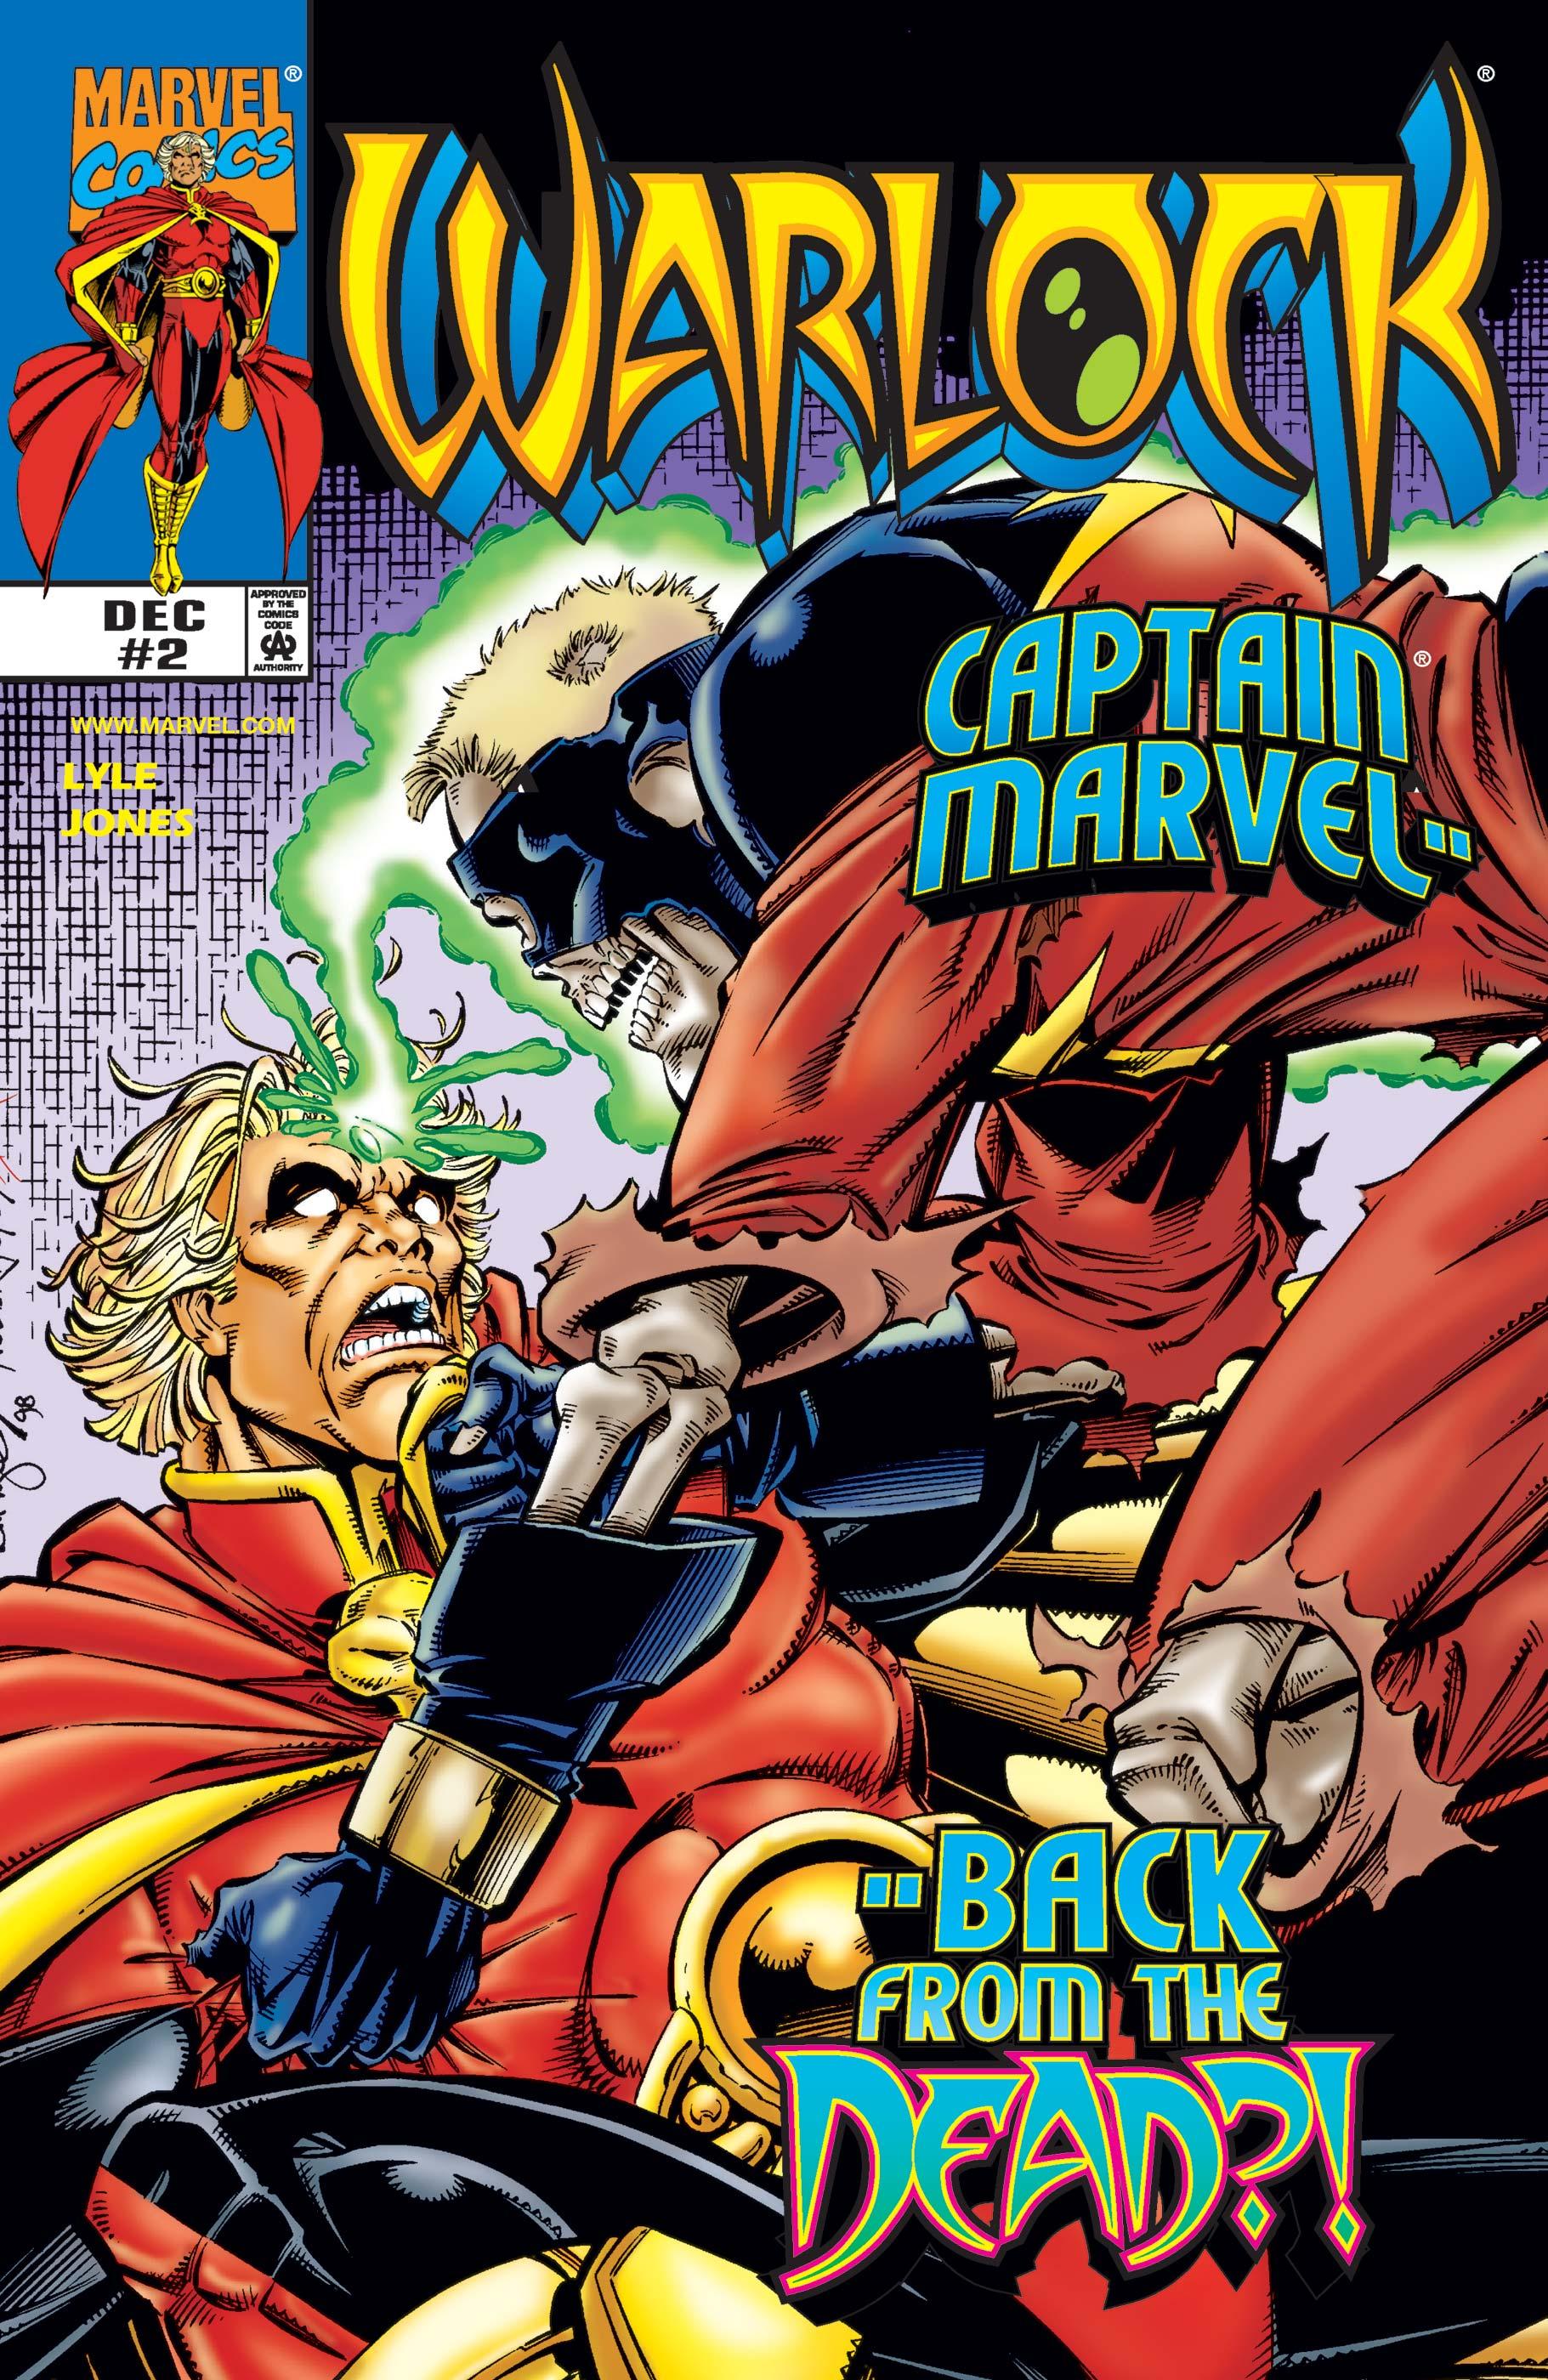 Warlock (1998) #2